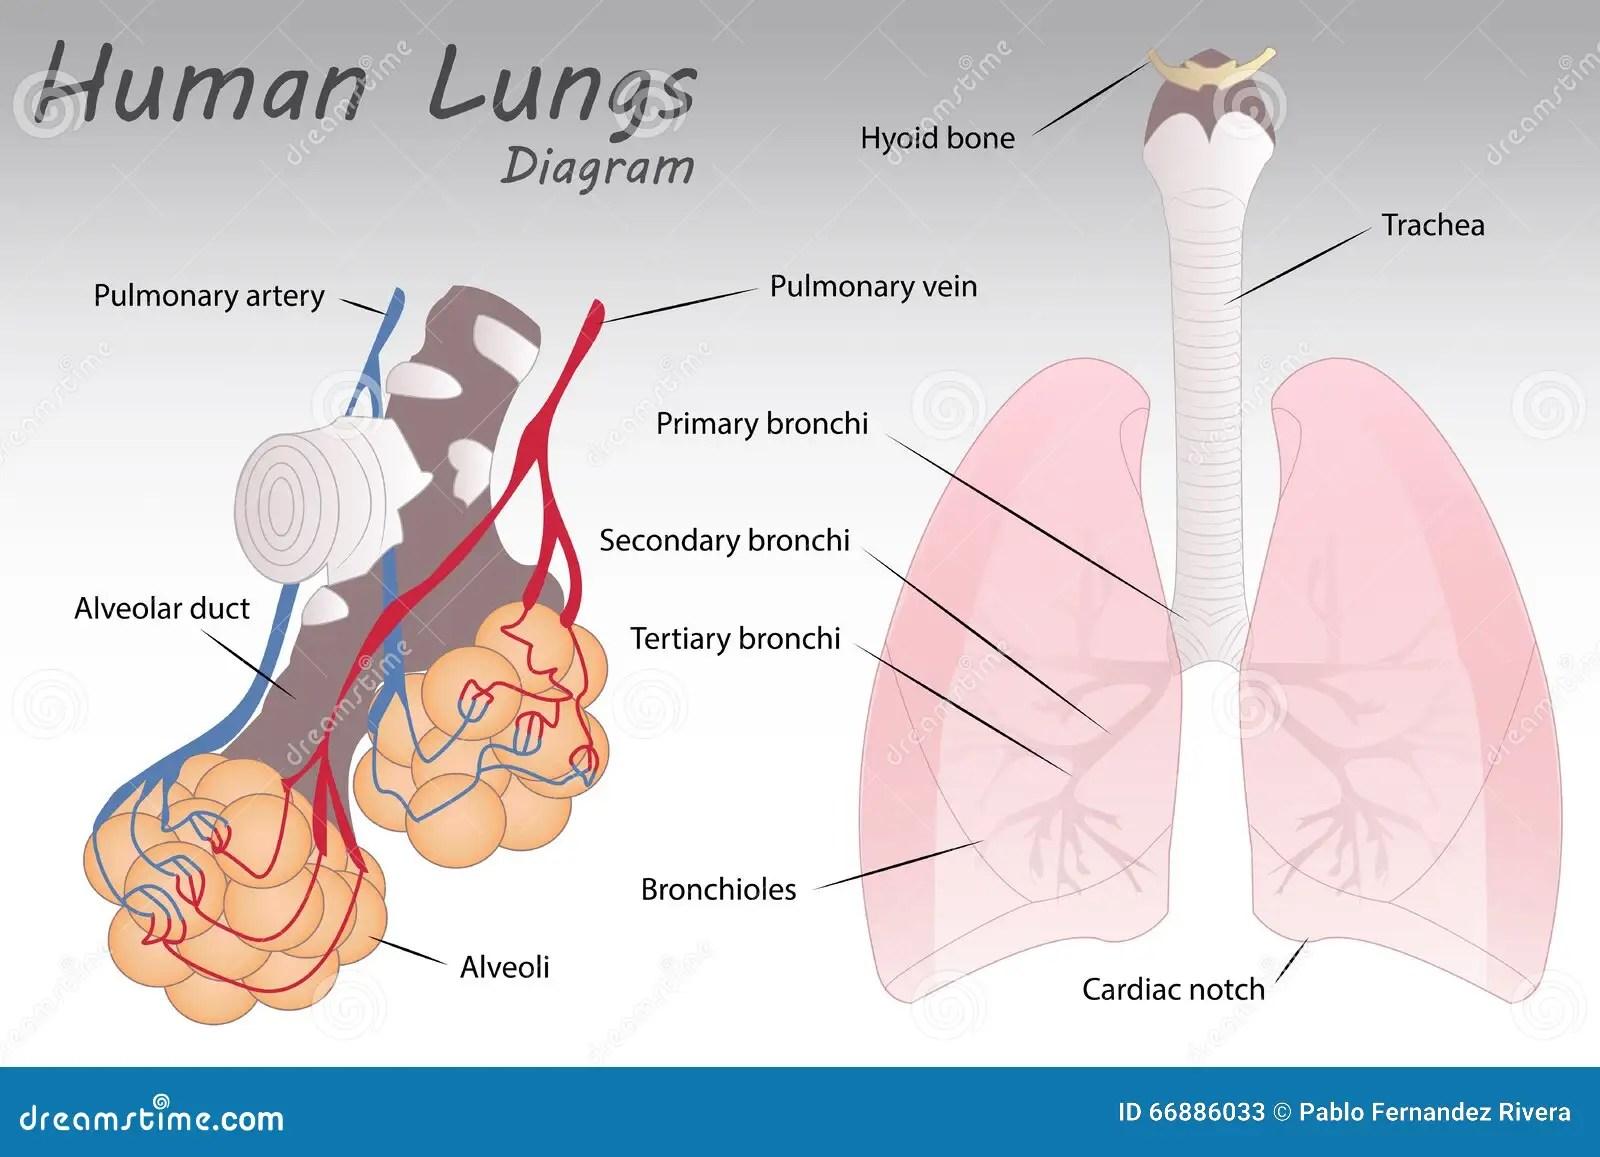 human heart and lungs diagram motorguide trolling motor parts royalty free cartoon cartoondealer 78103310